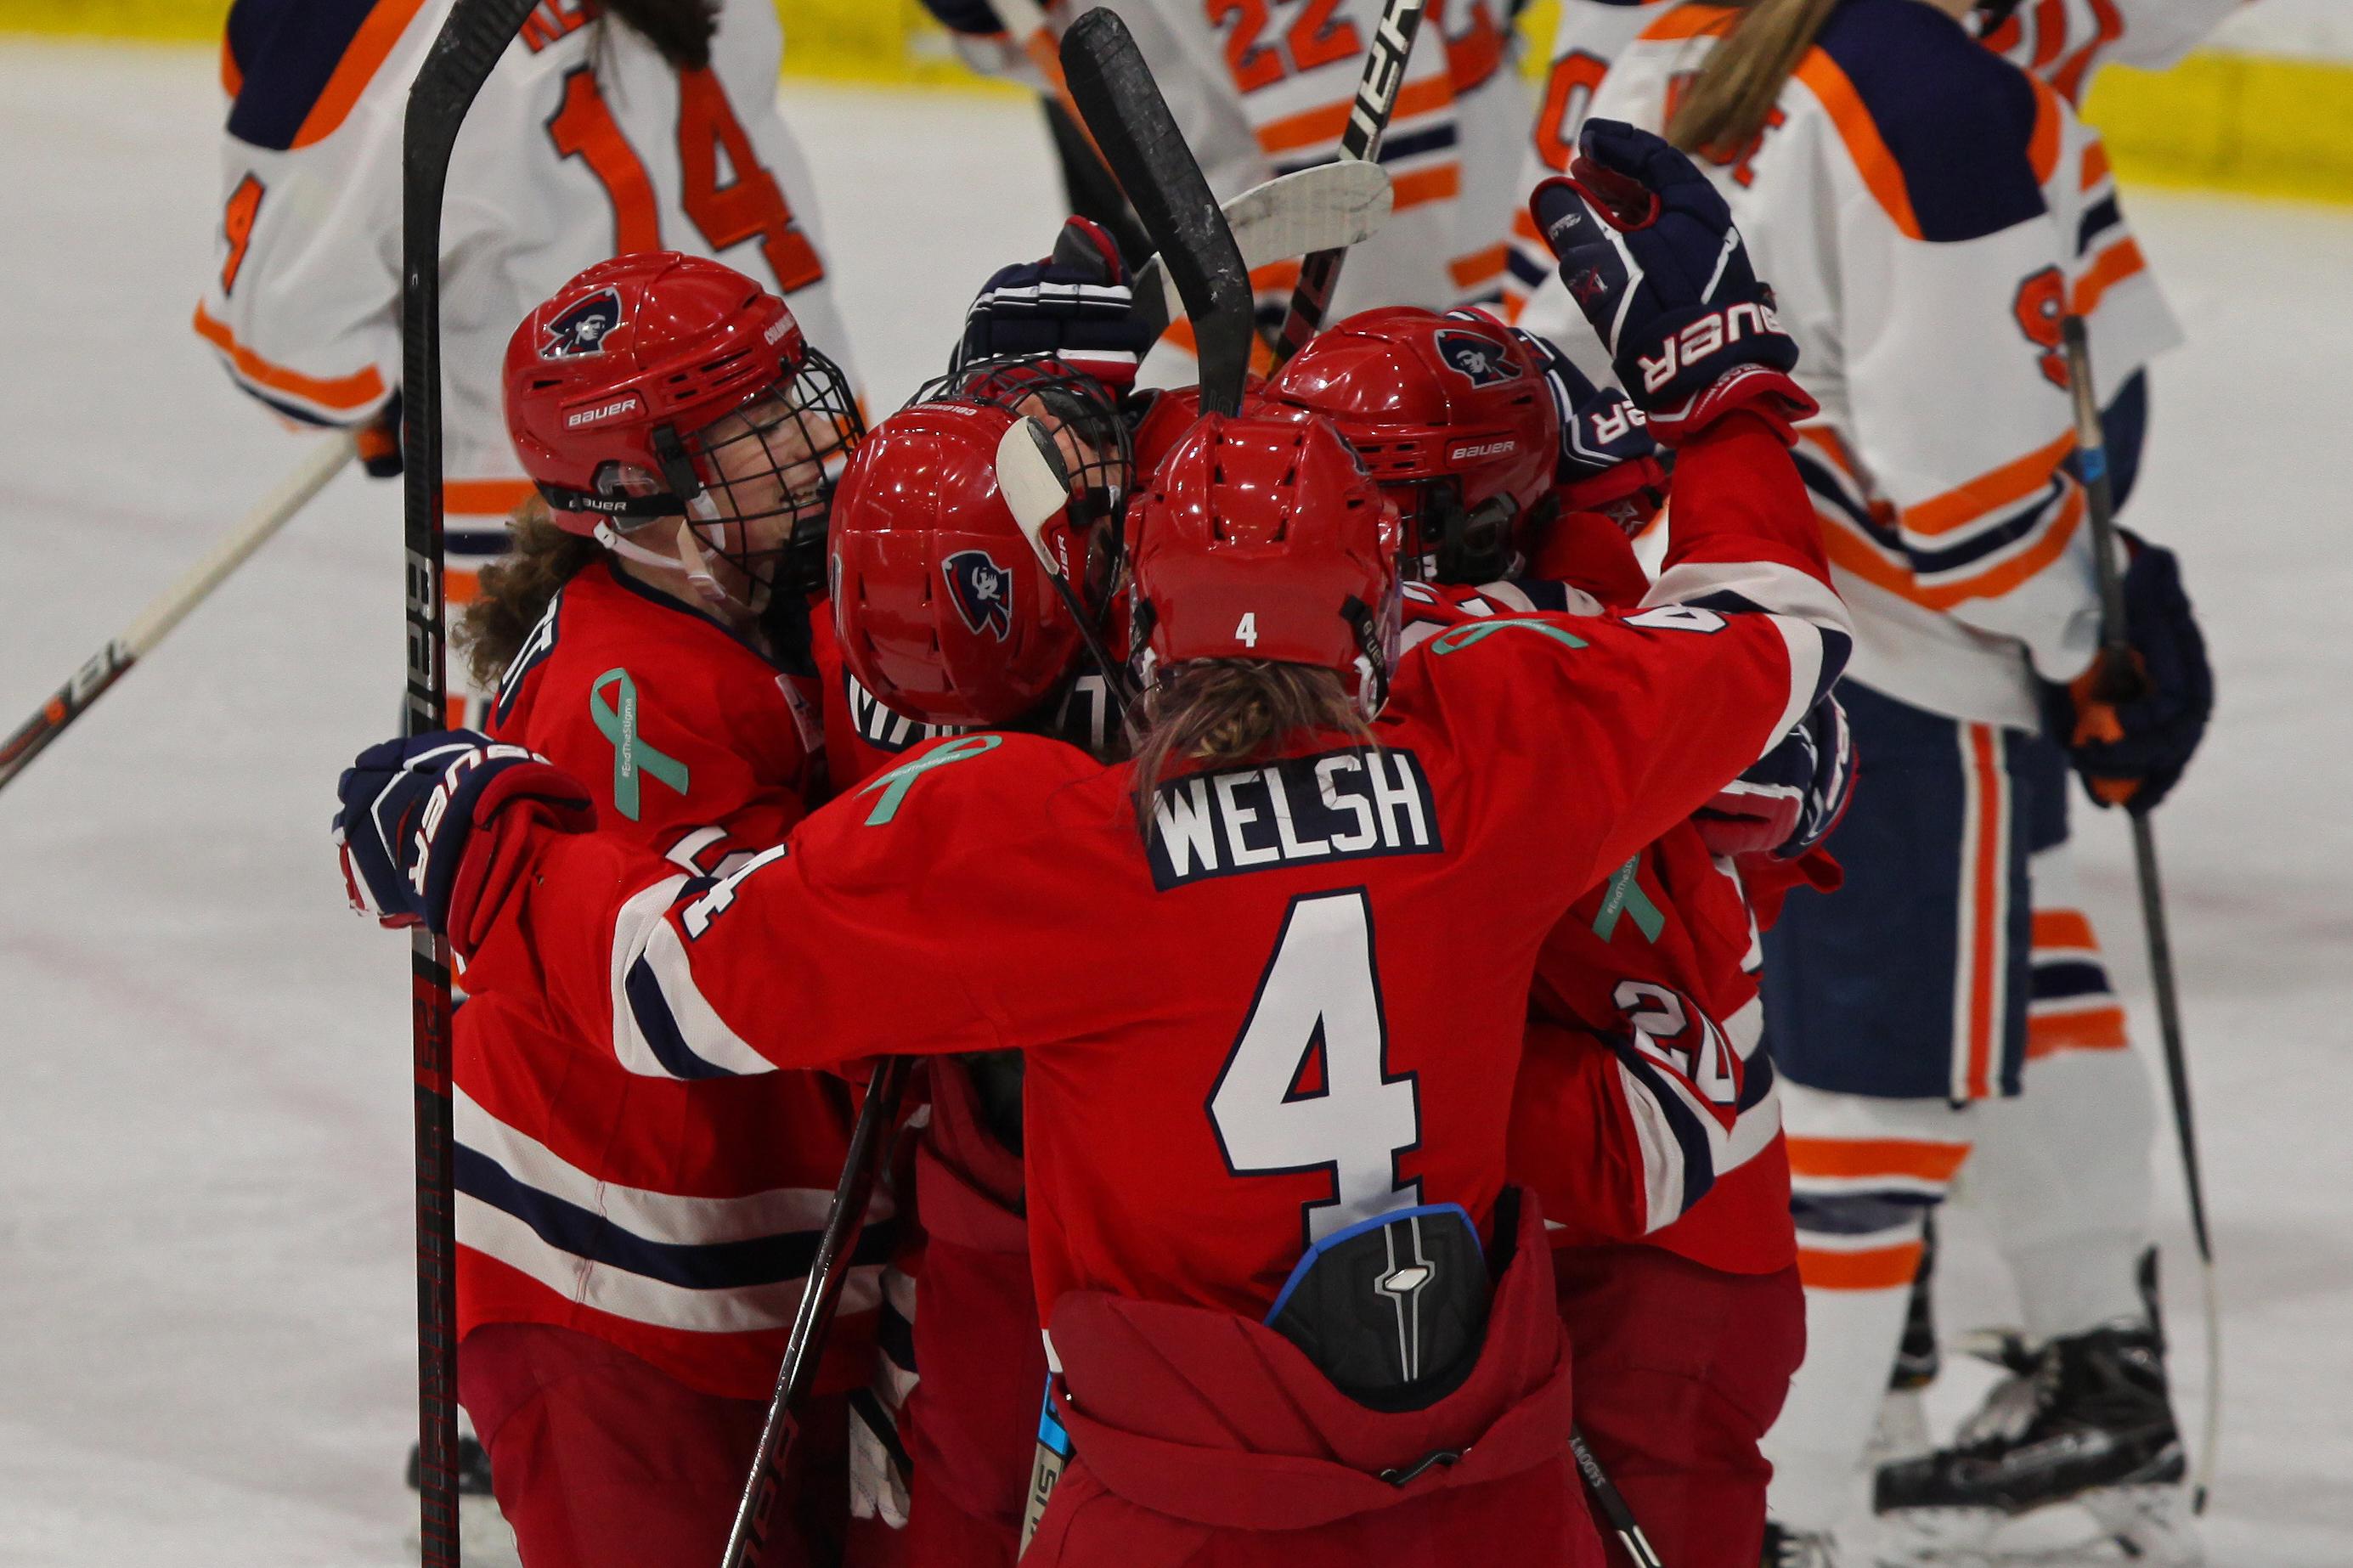 Kirsten Welsh and her Robert Morris teammates celebrate a goal against the Syracuse Orange.